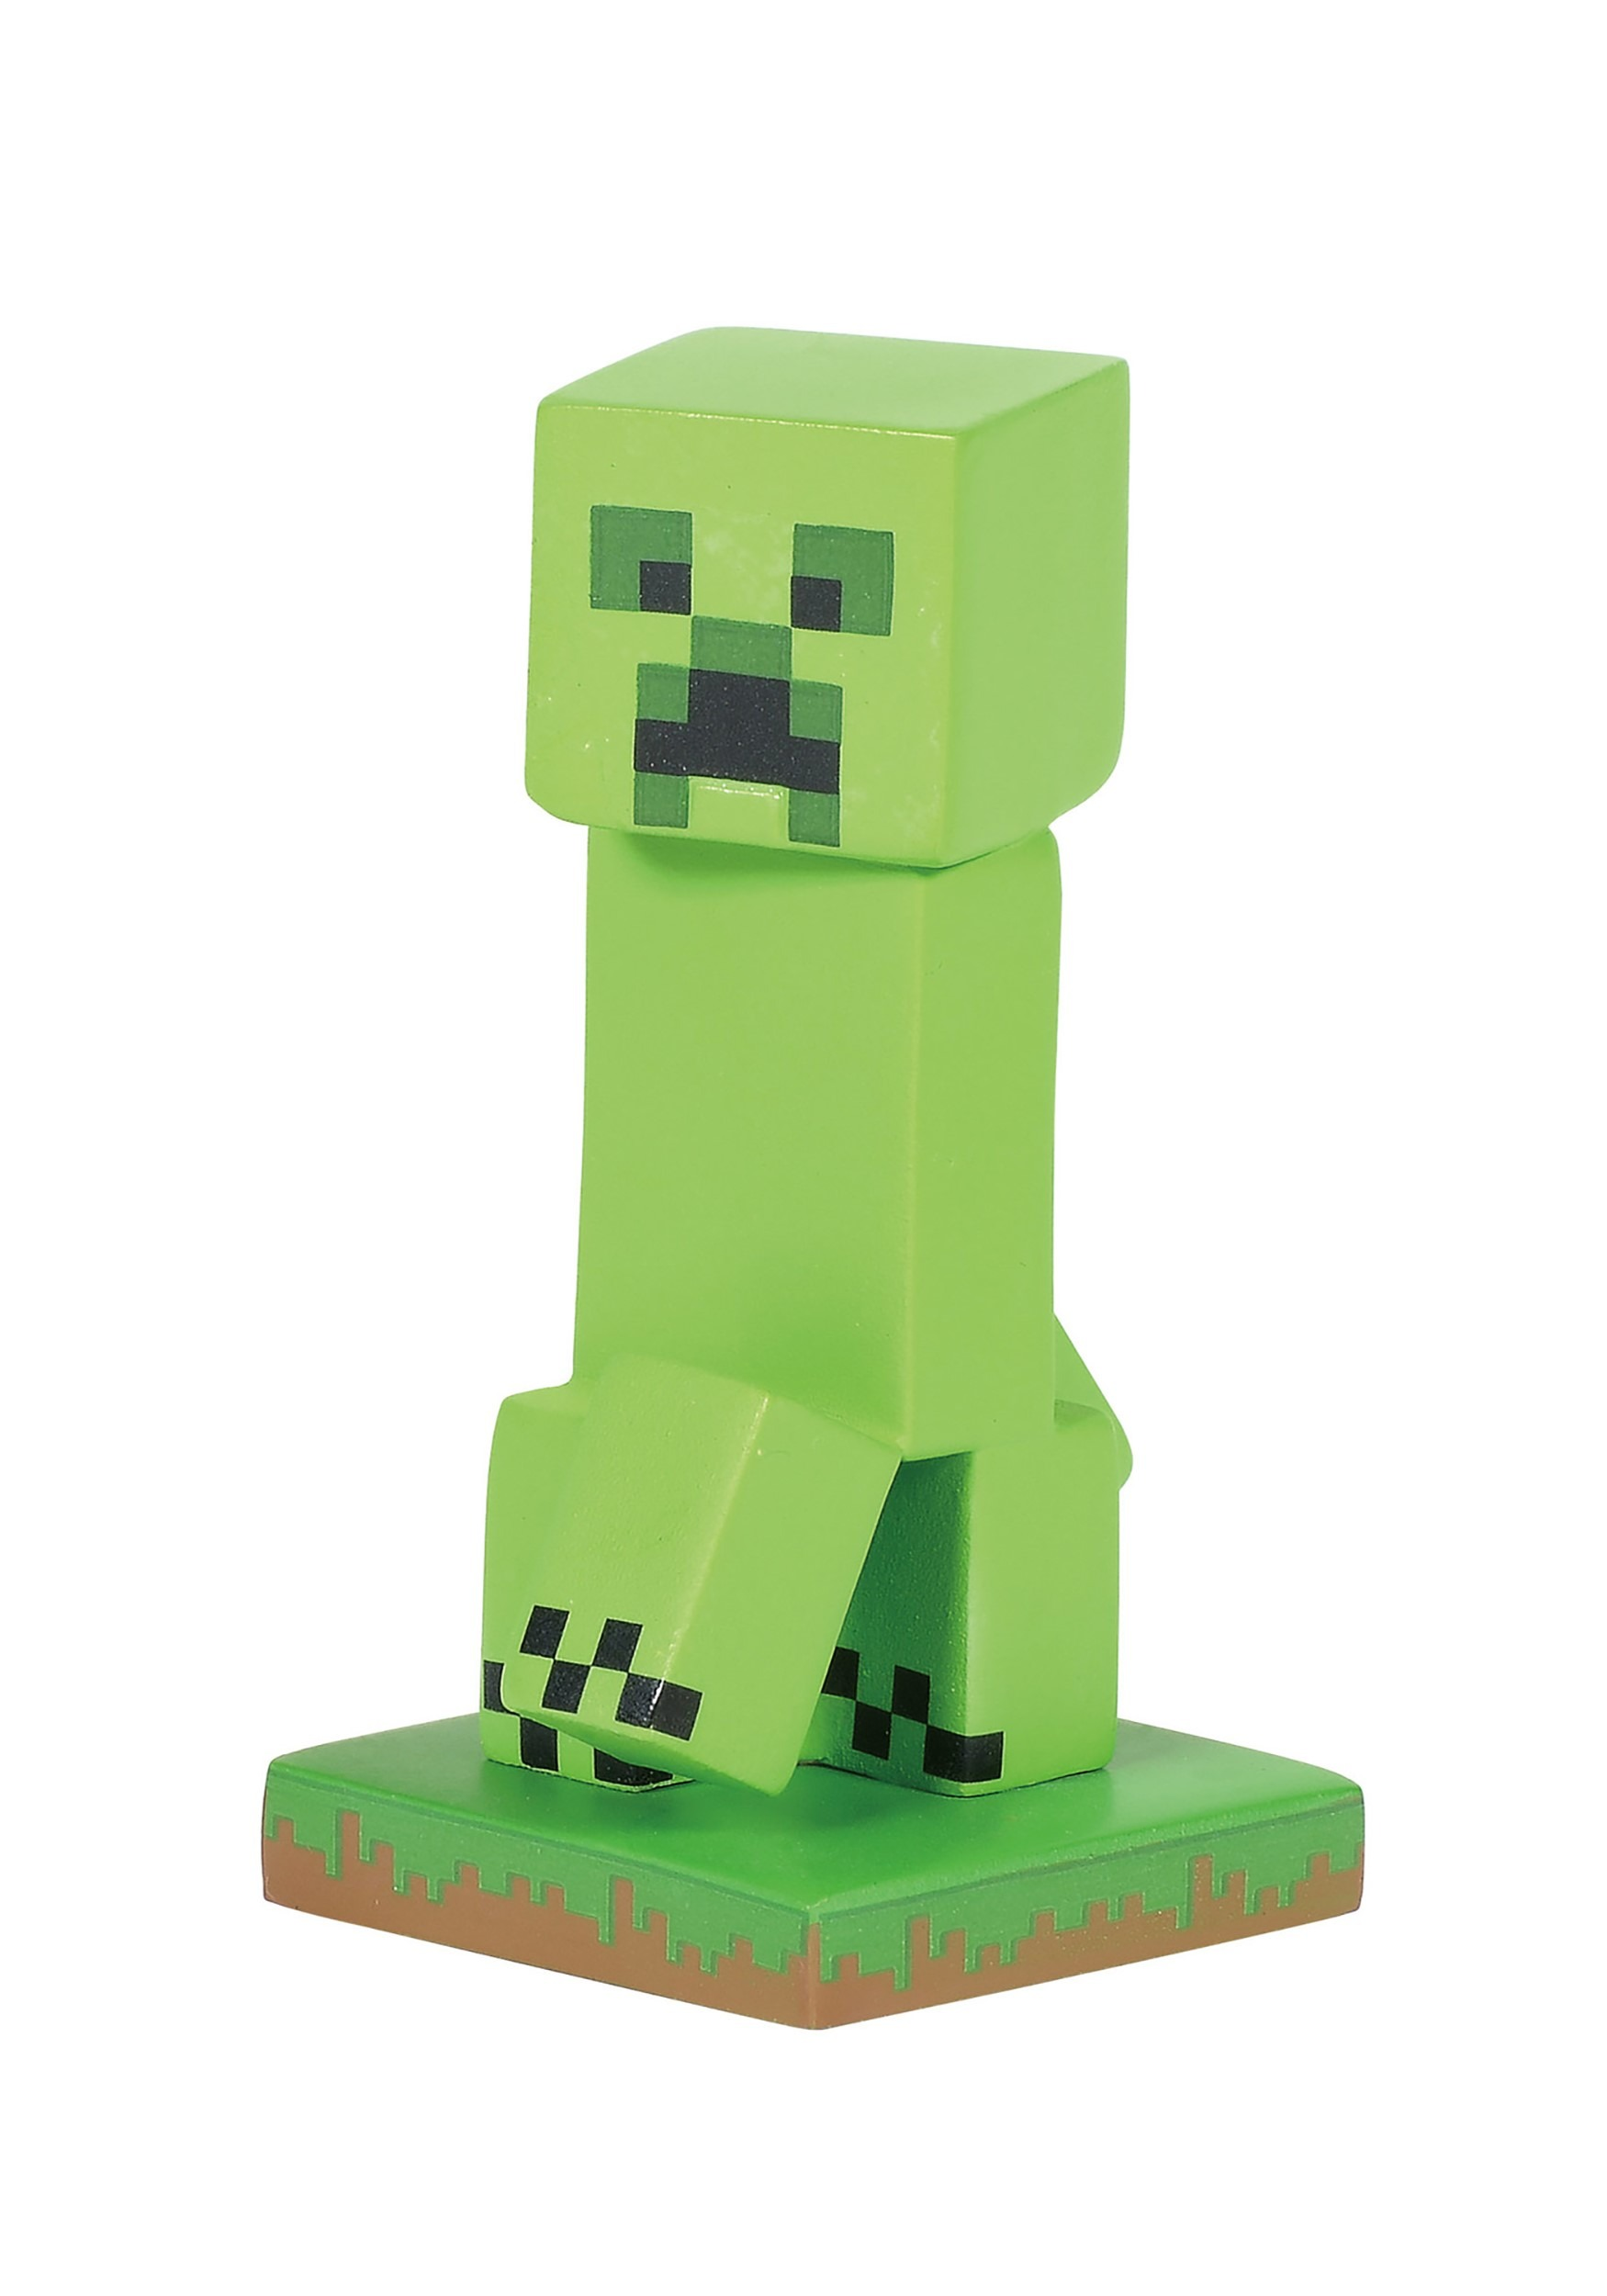 Minecraft Creeper Collectible Figurine